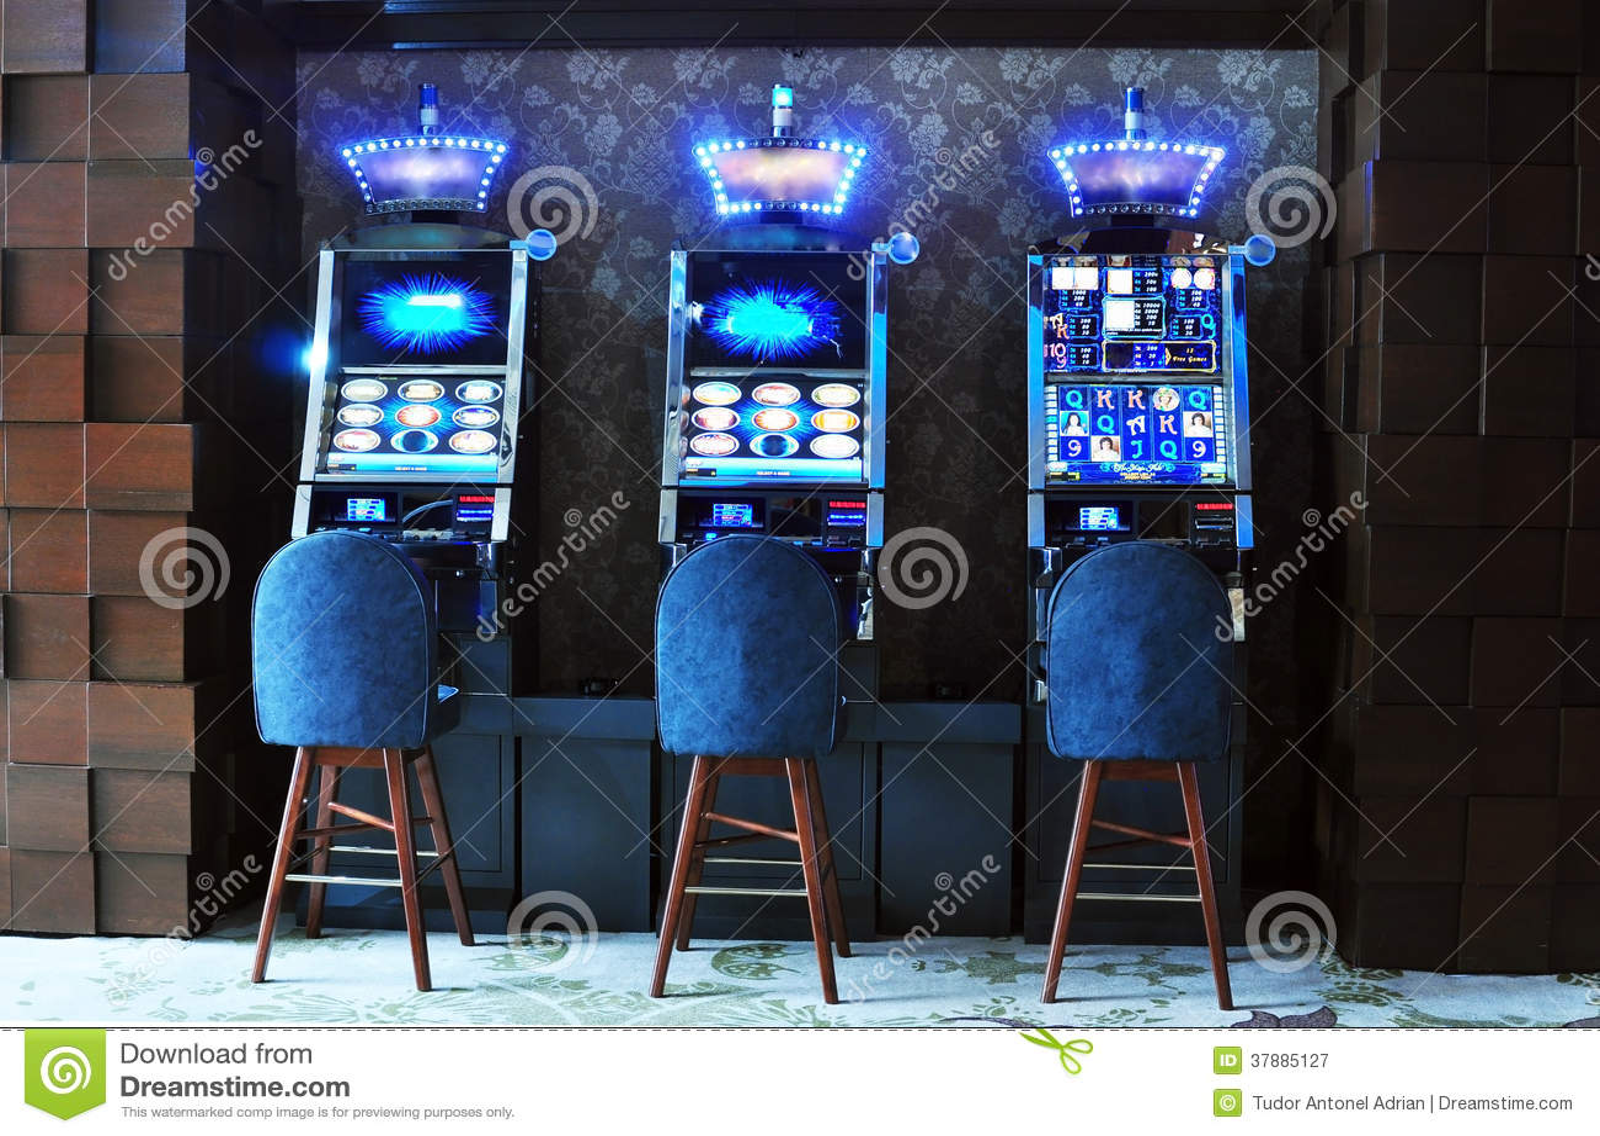 online real casinos